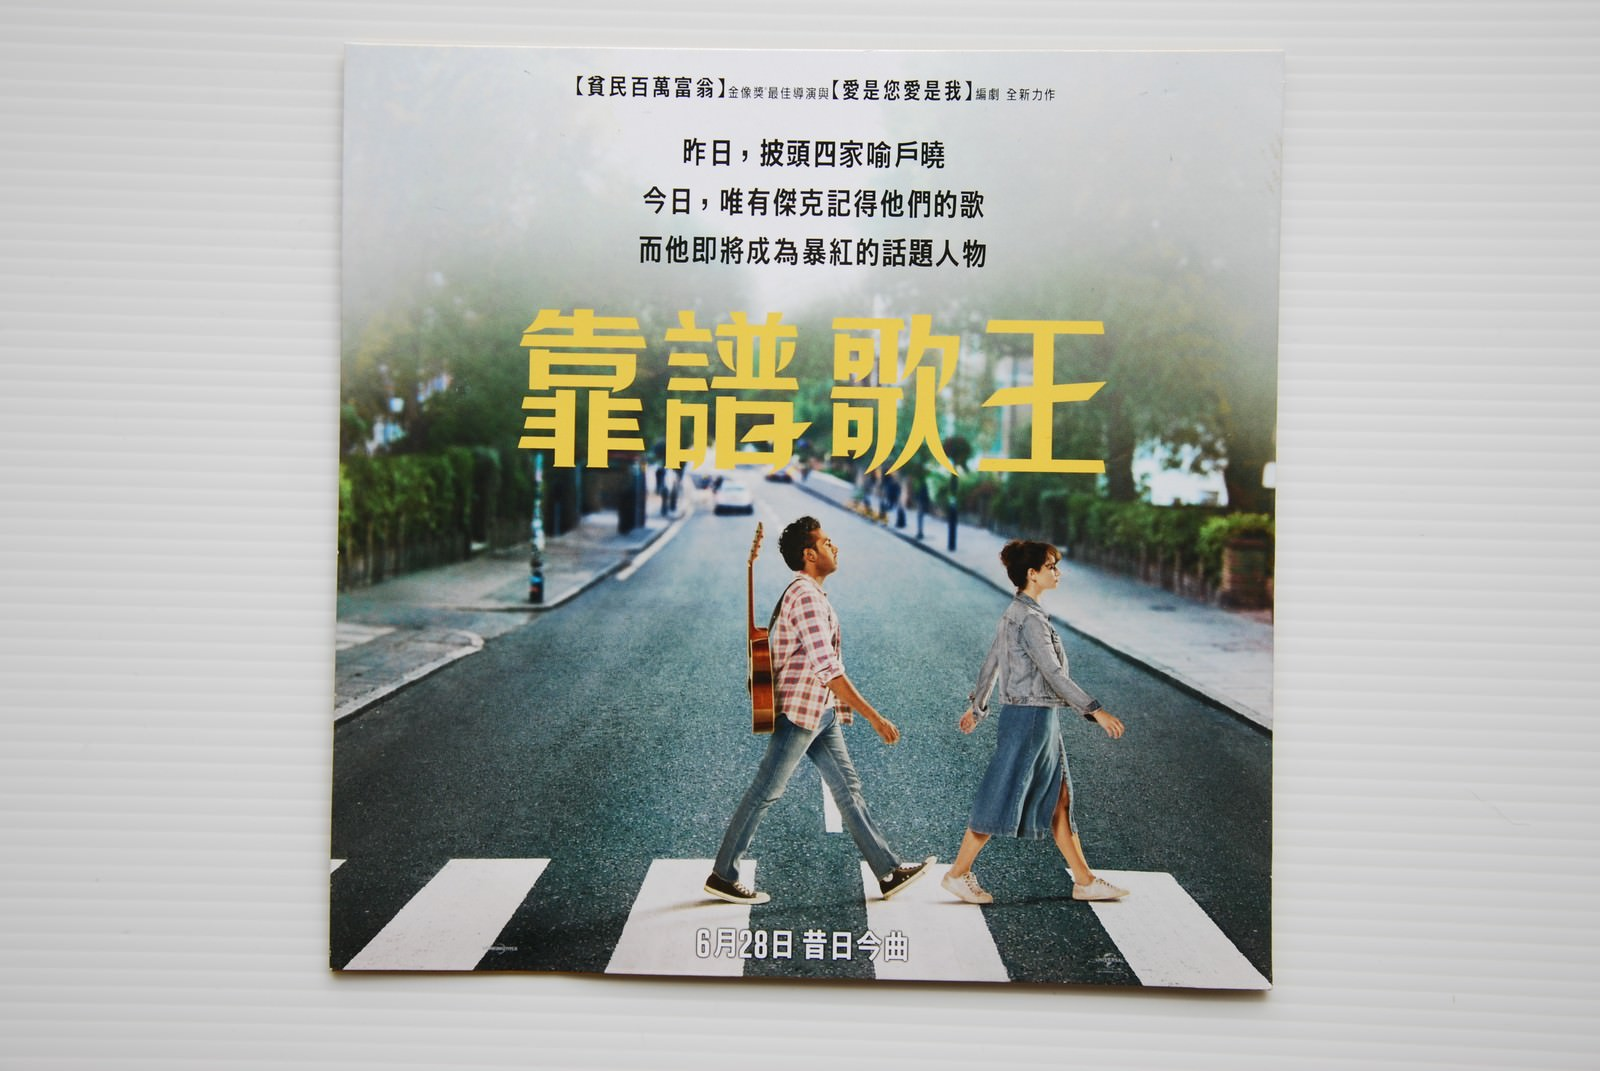 Movie, Yesterday(英國, 2019年) / 靠譜歌王(台灣) / 昨日奇迹(中國) / 緣來自昨天(香港), 特映會邀請卡